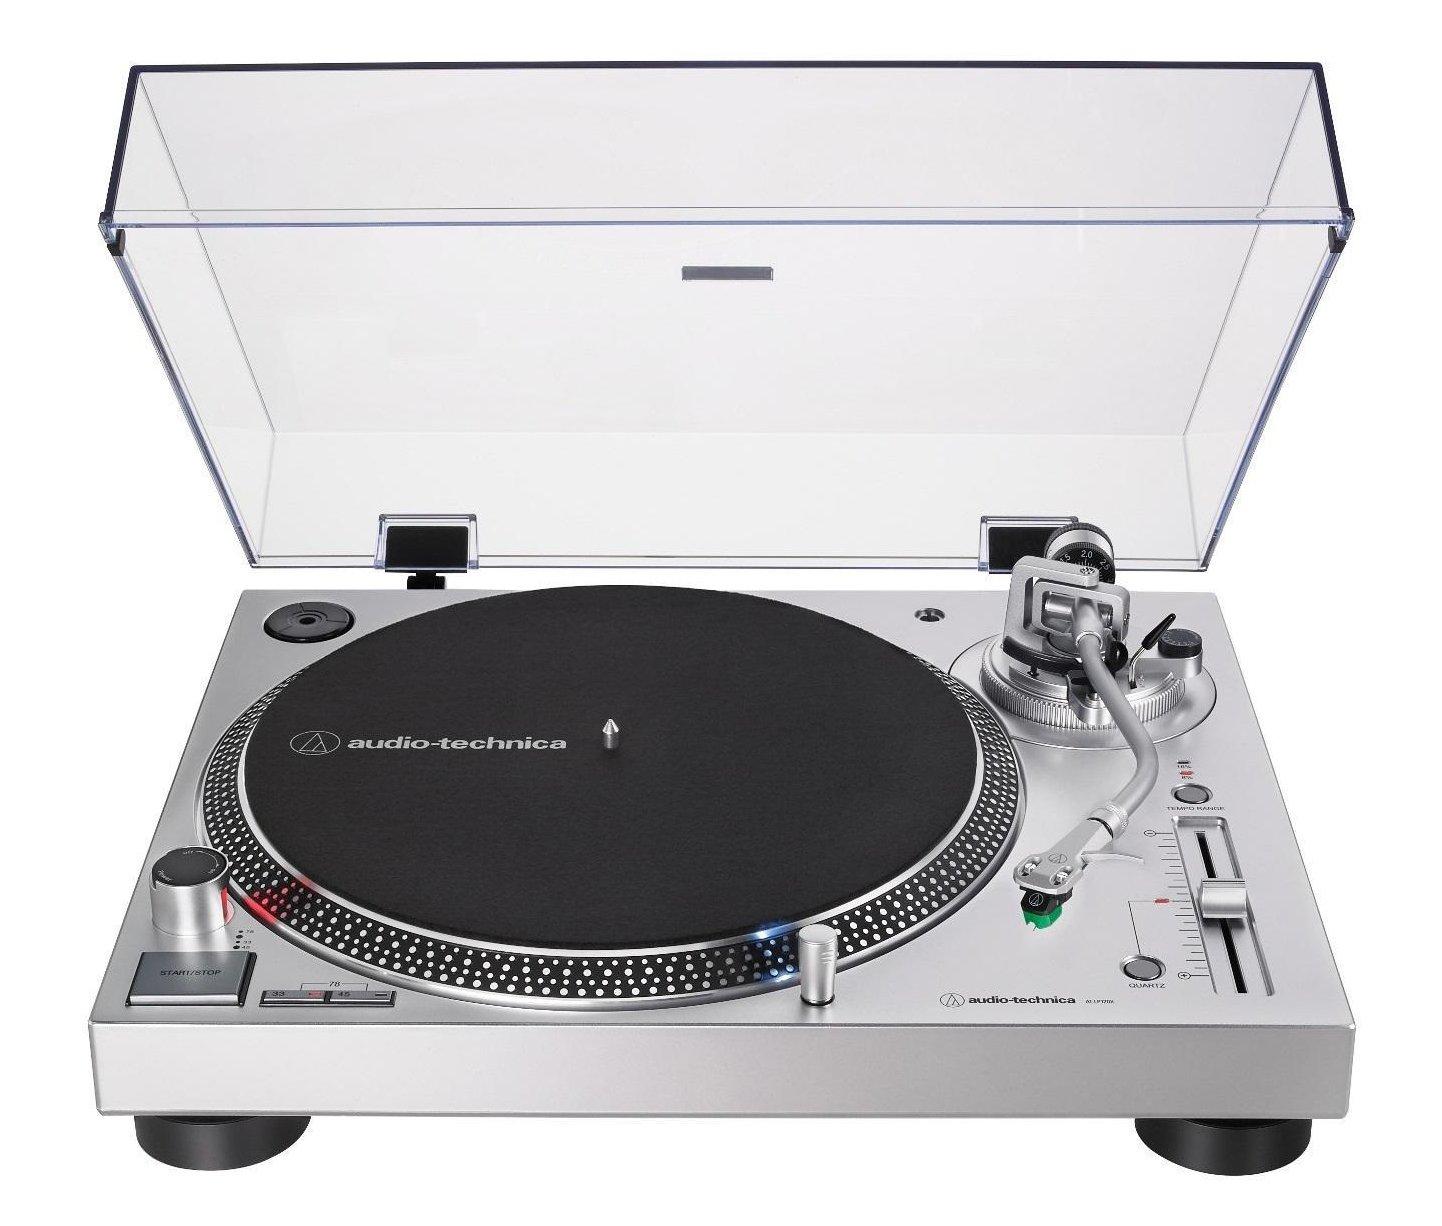 Audio-Technica AT-LP120XUSBSV Direct-Drive Record Player